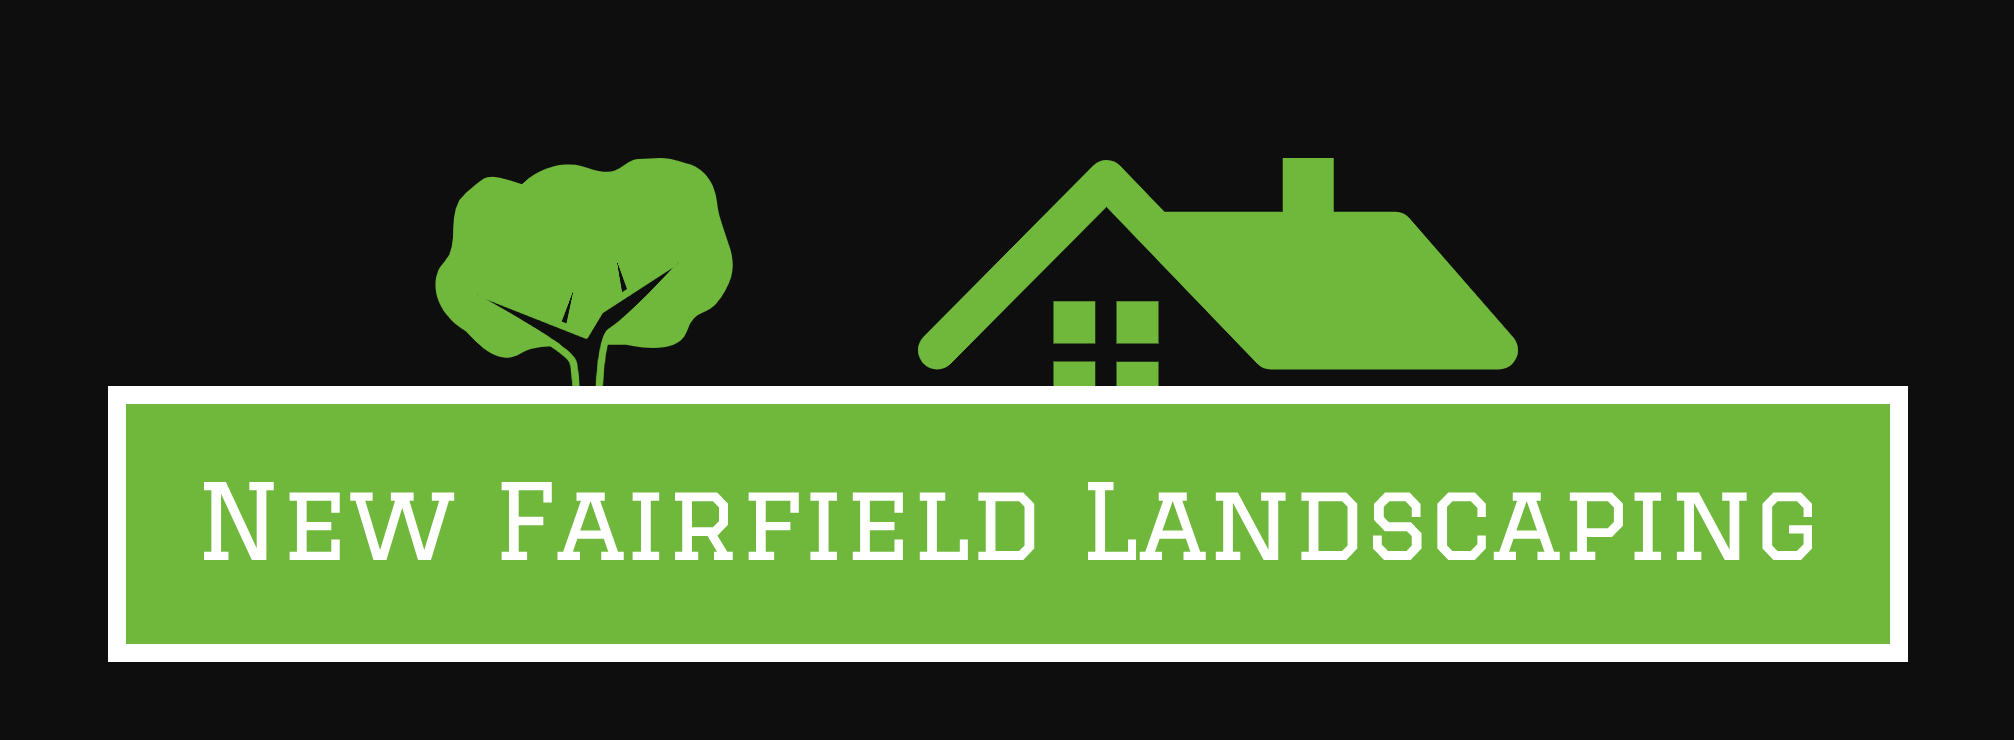 logo-new-fairfield-landscaping